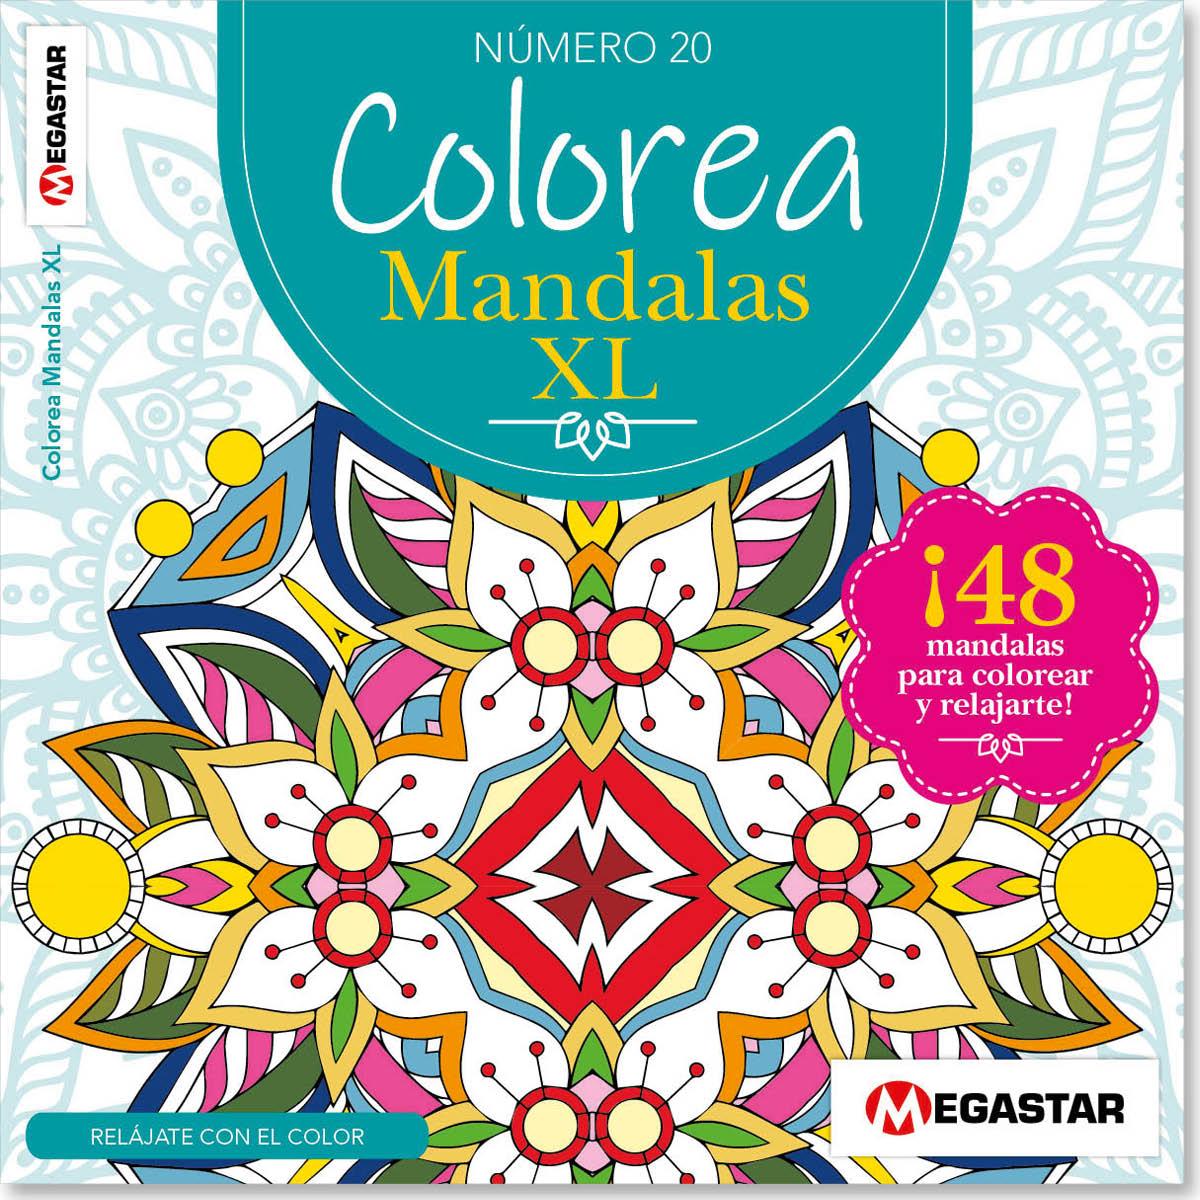 Colorea Mandalas XXL